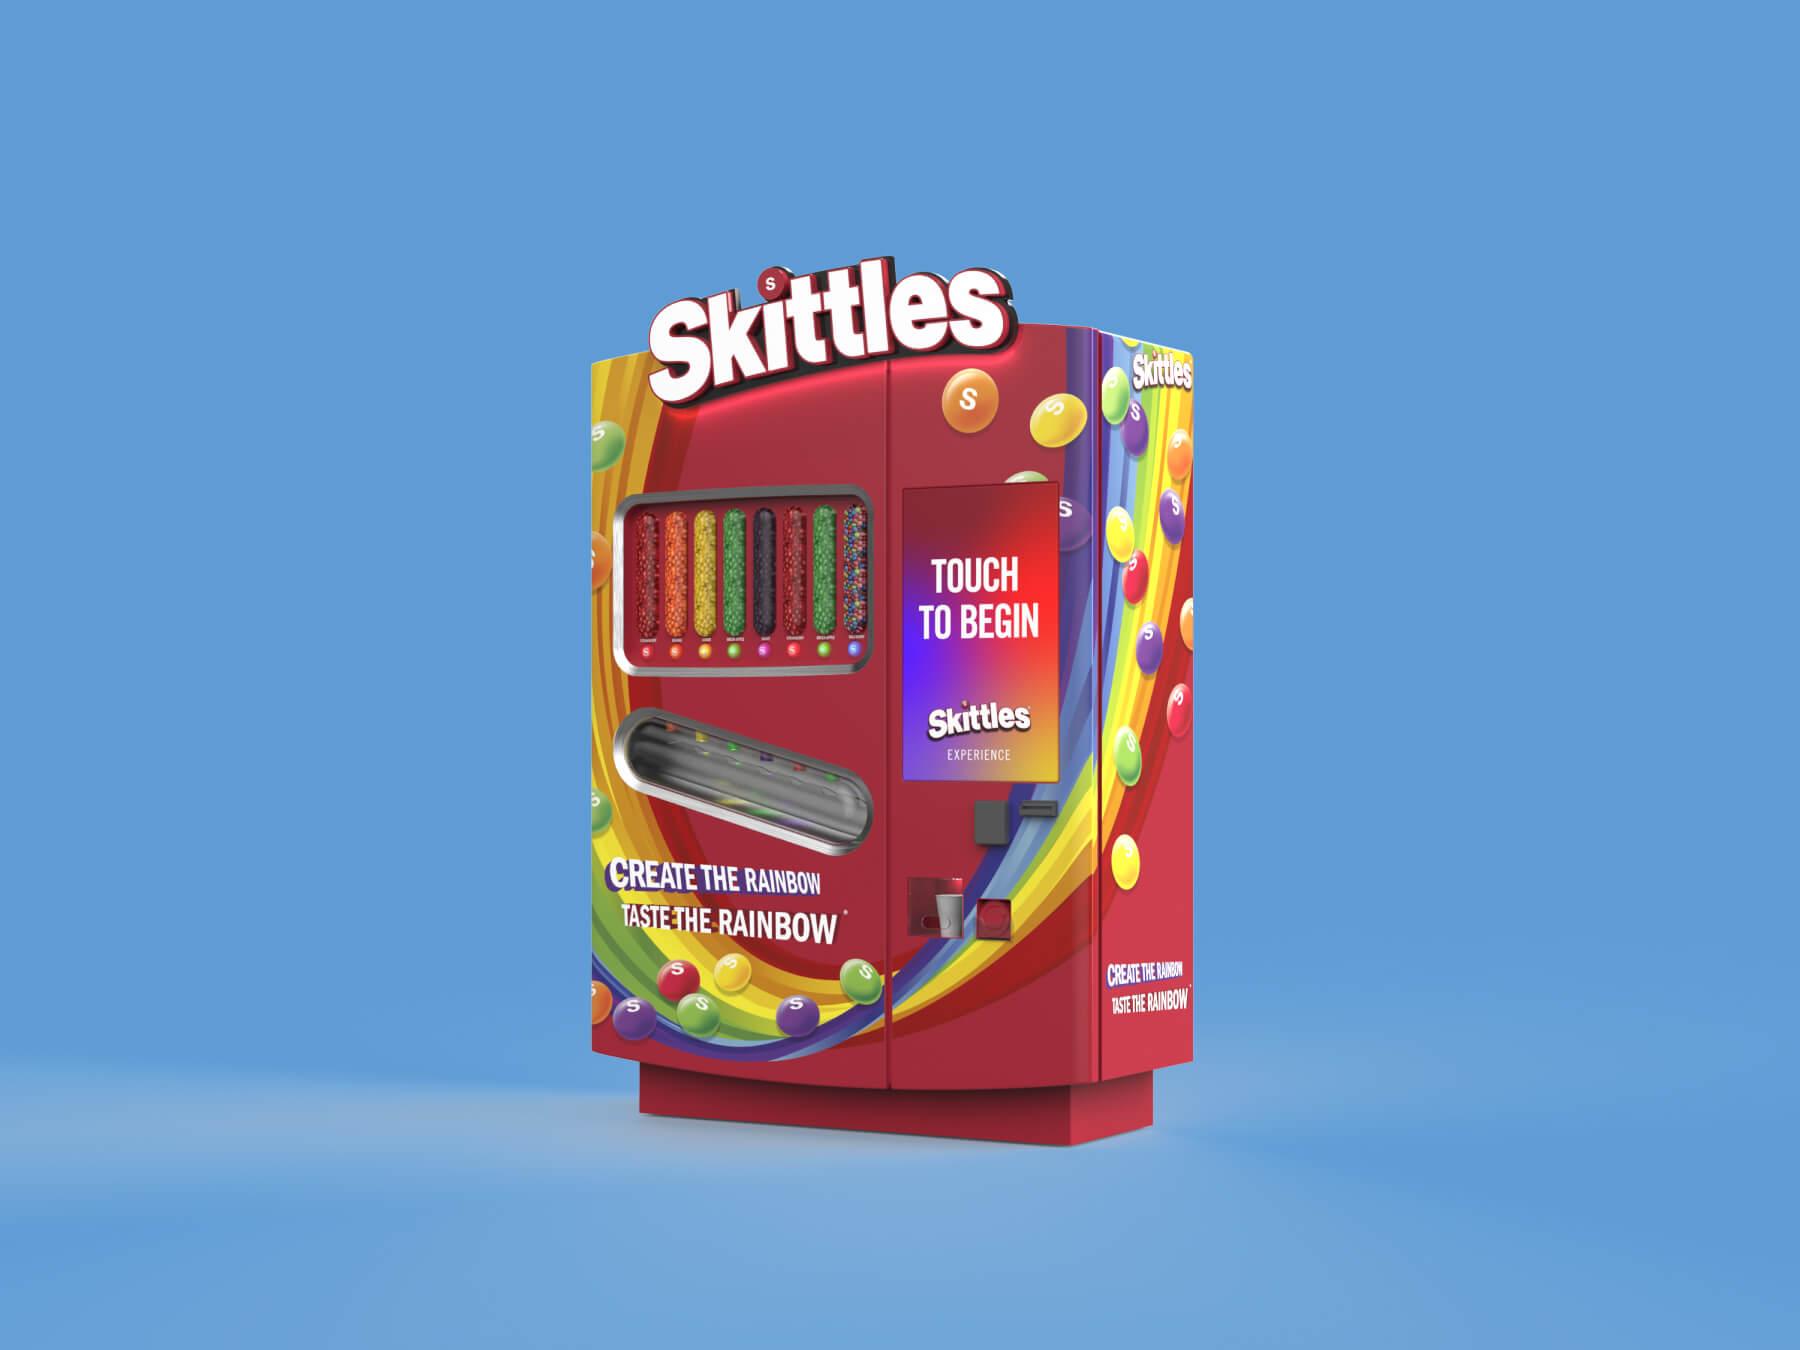 1800w-SkittlesVendingMachine-Thumbnail-01